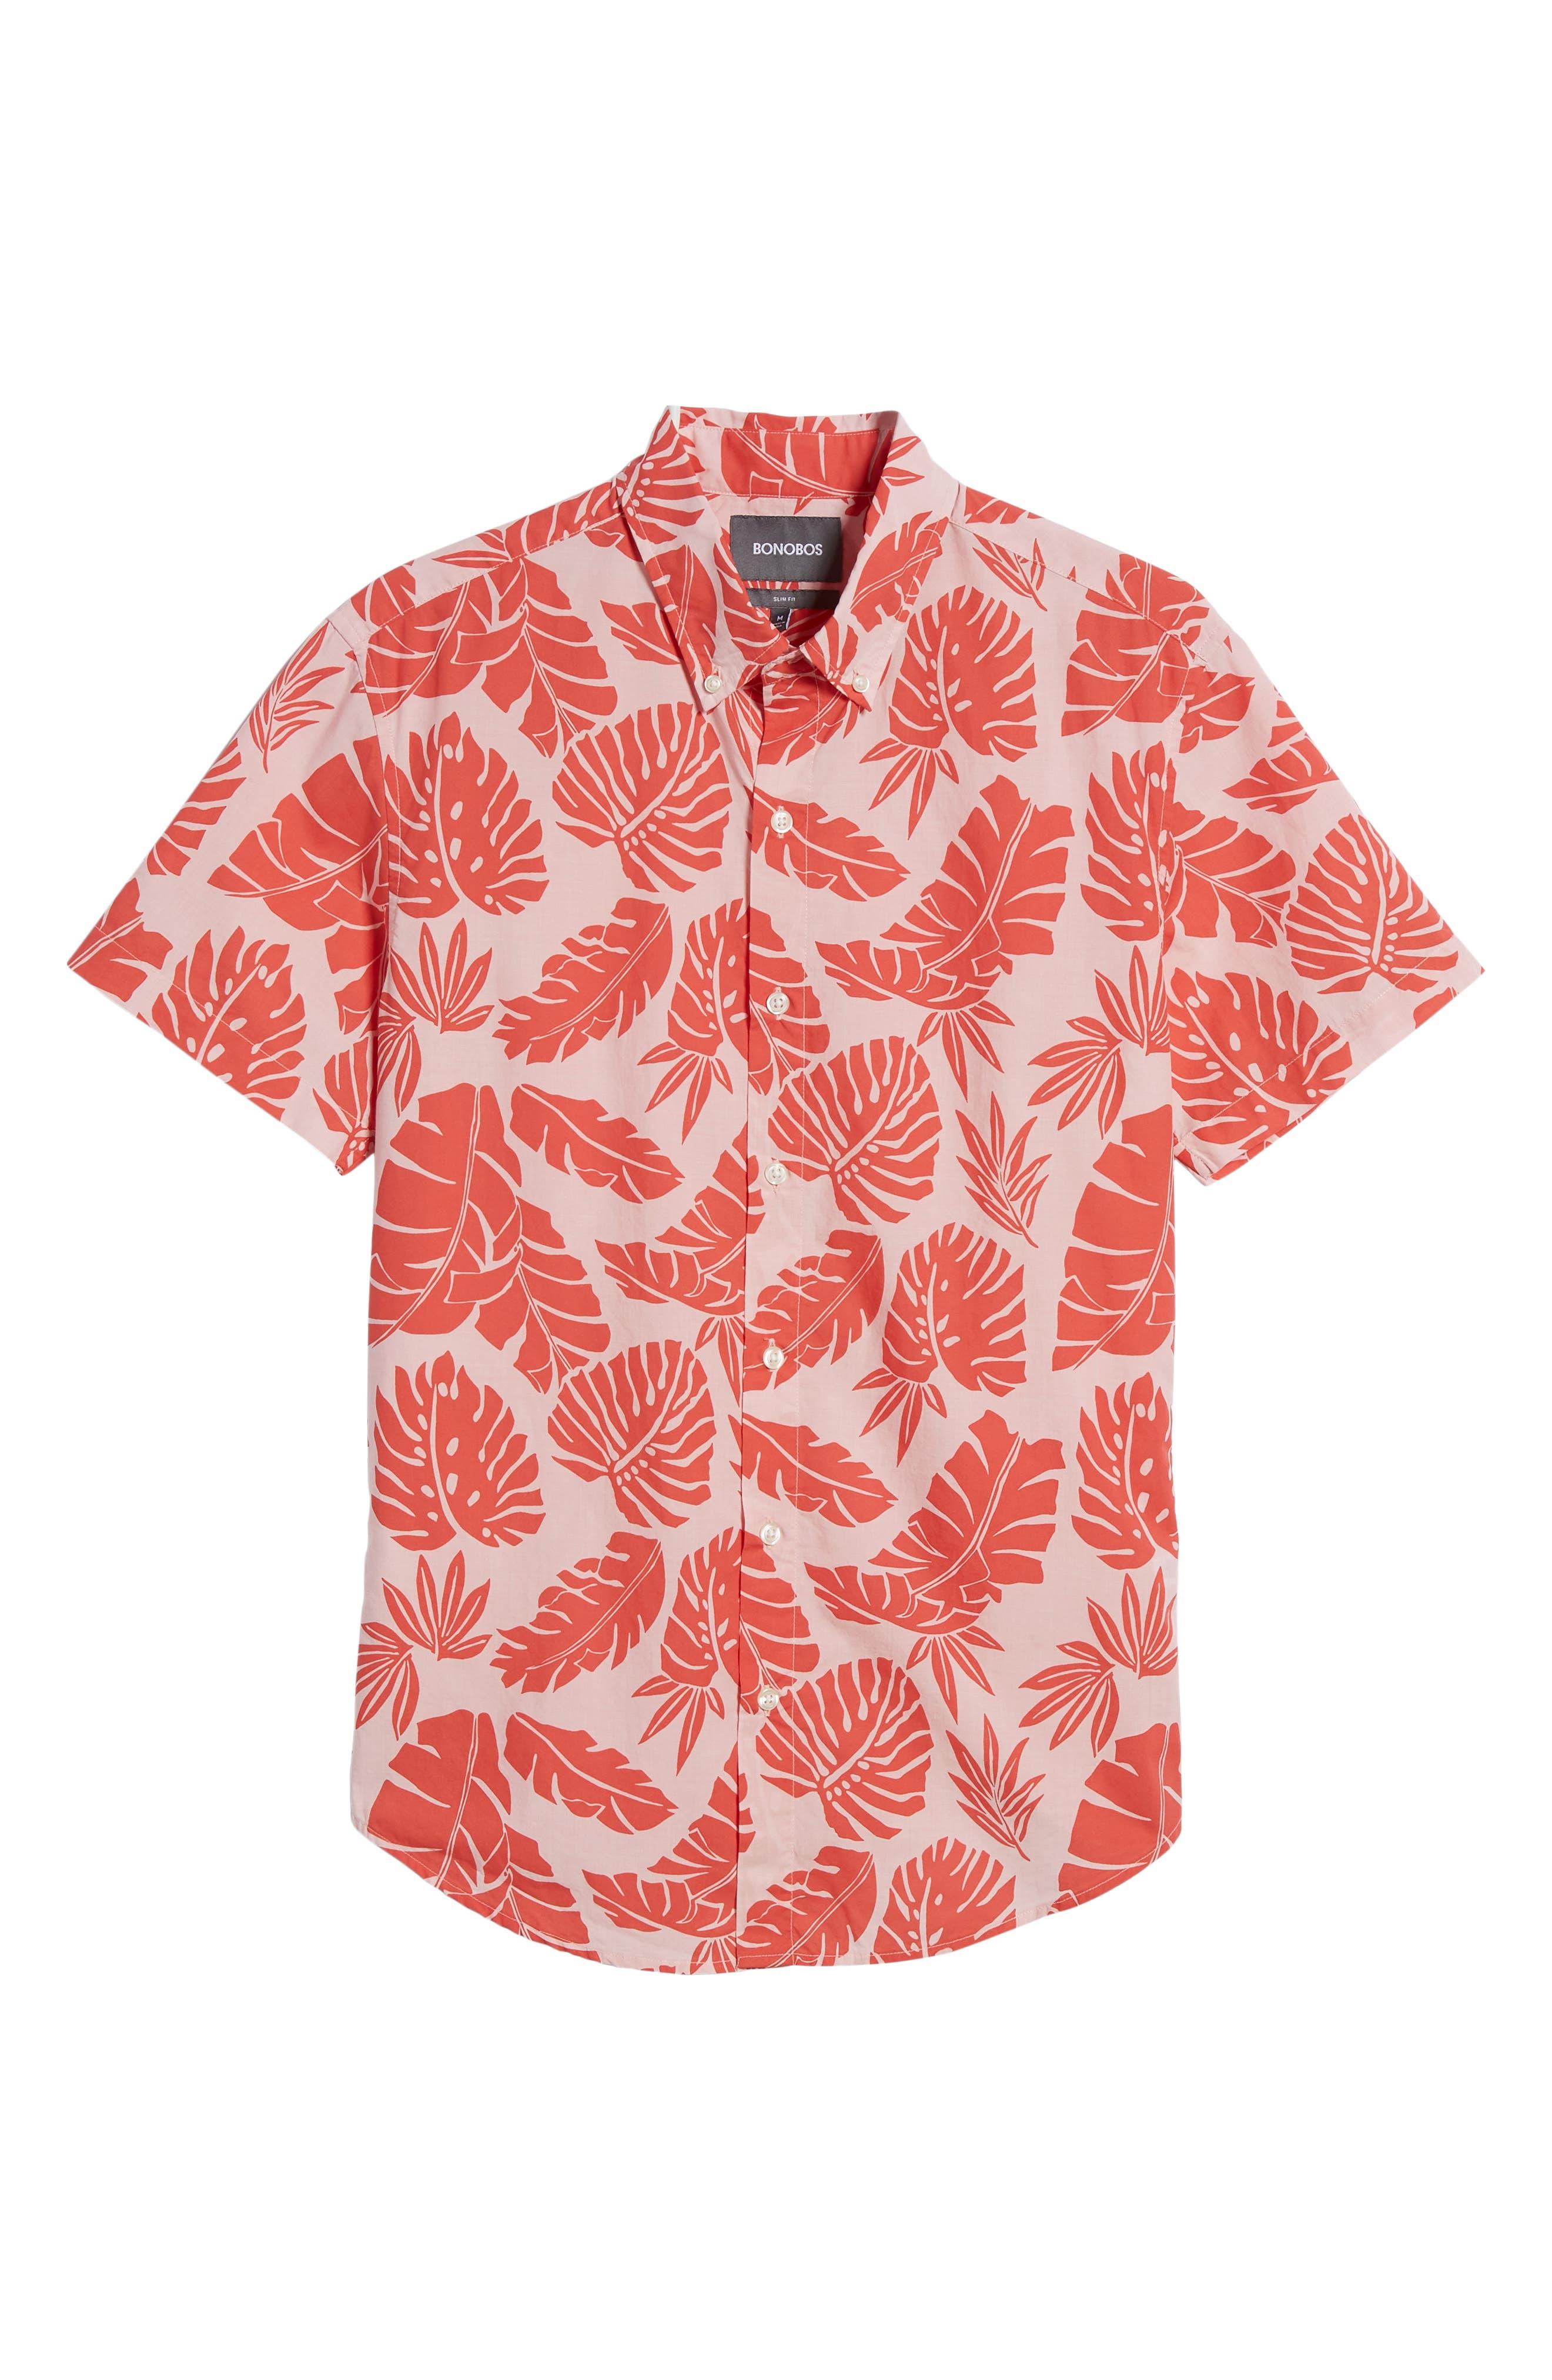 Riviera Slim Fit Palm Print Sport Shirt,                             Alternate thumbnail 6, color,                             PALM SCATTER - CORAL FAN